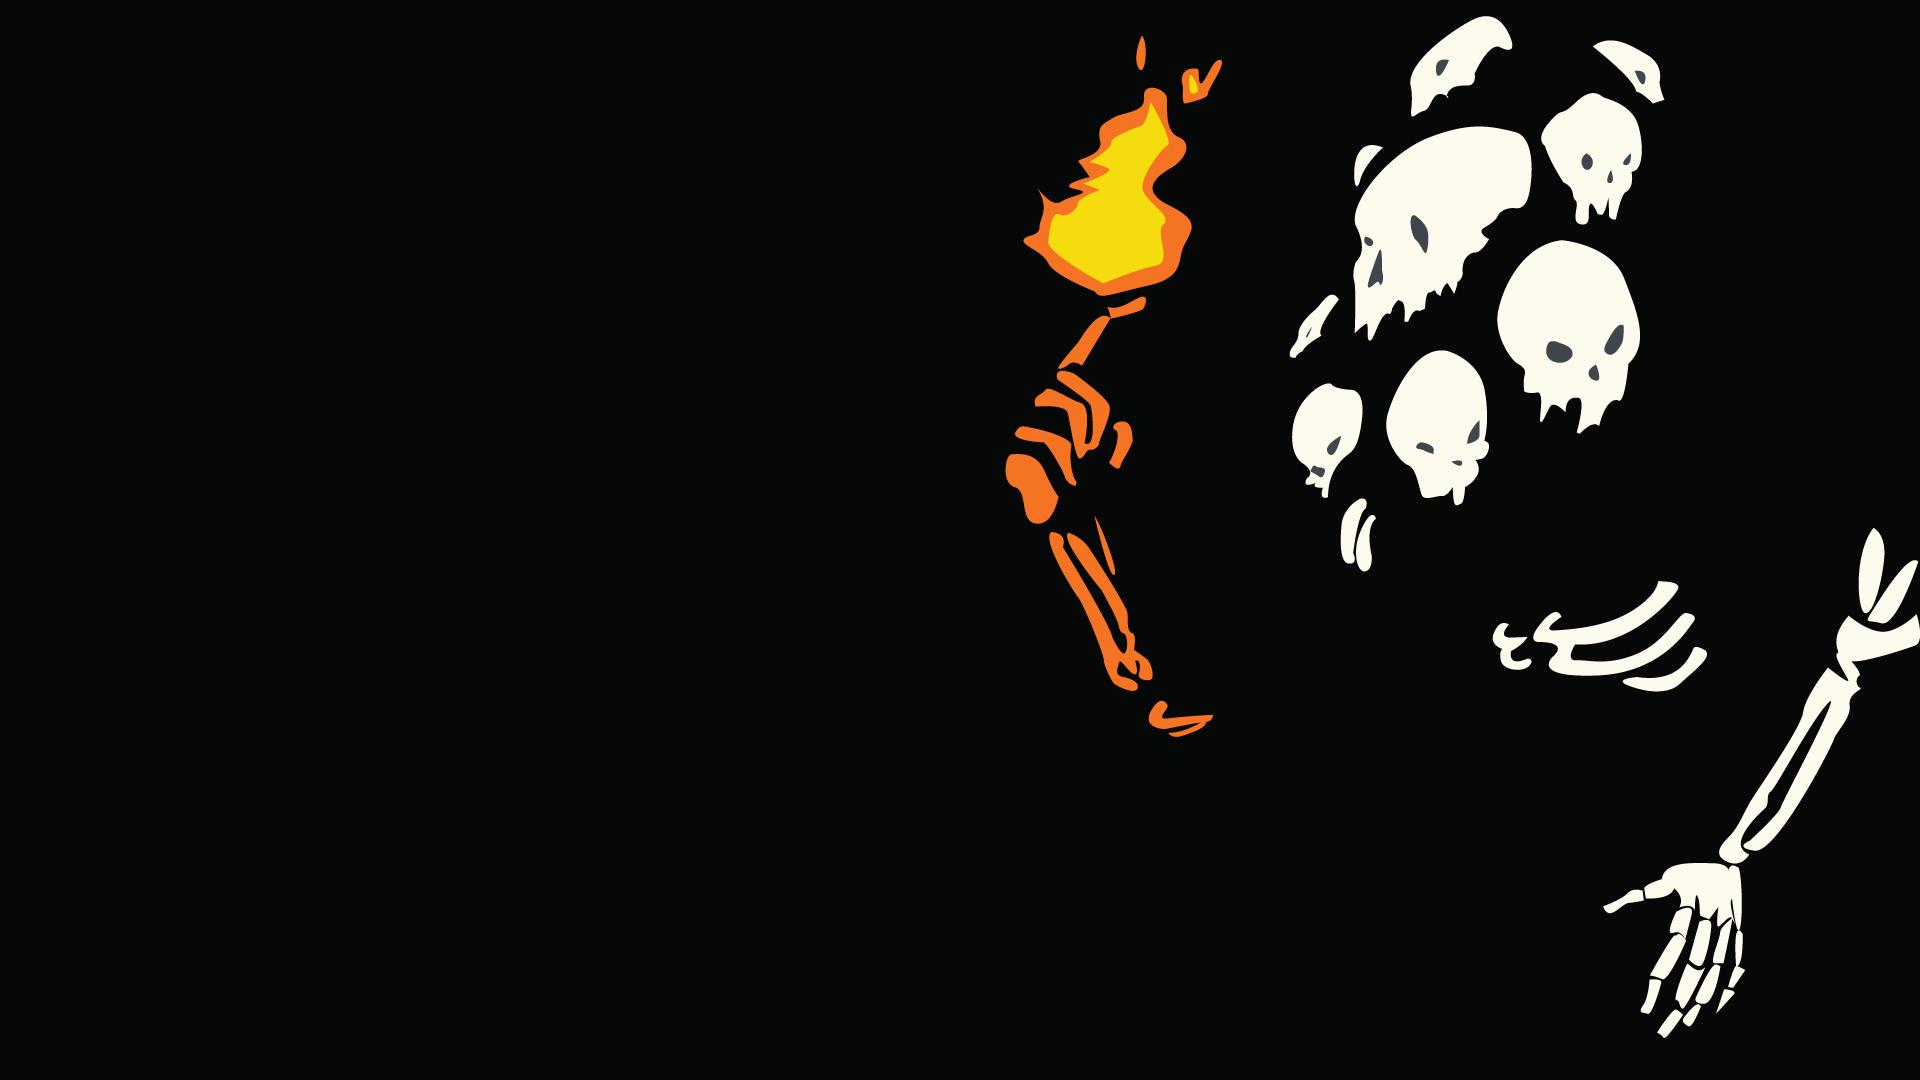 Dark Souls Nito Black wallpaper   1920x1080   77707 ...